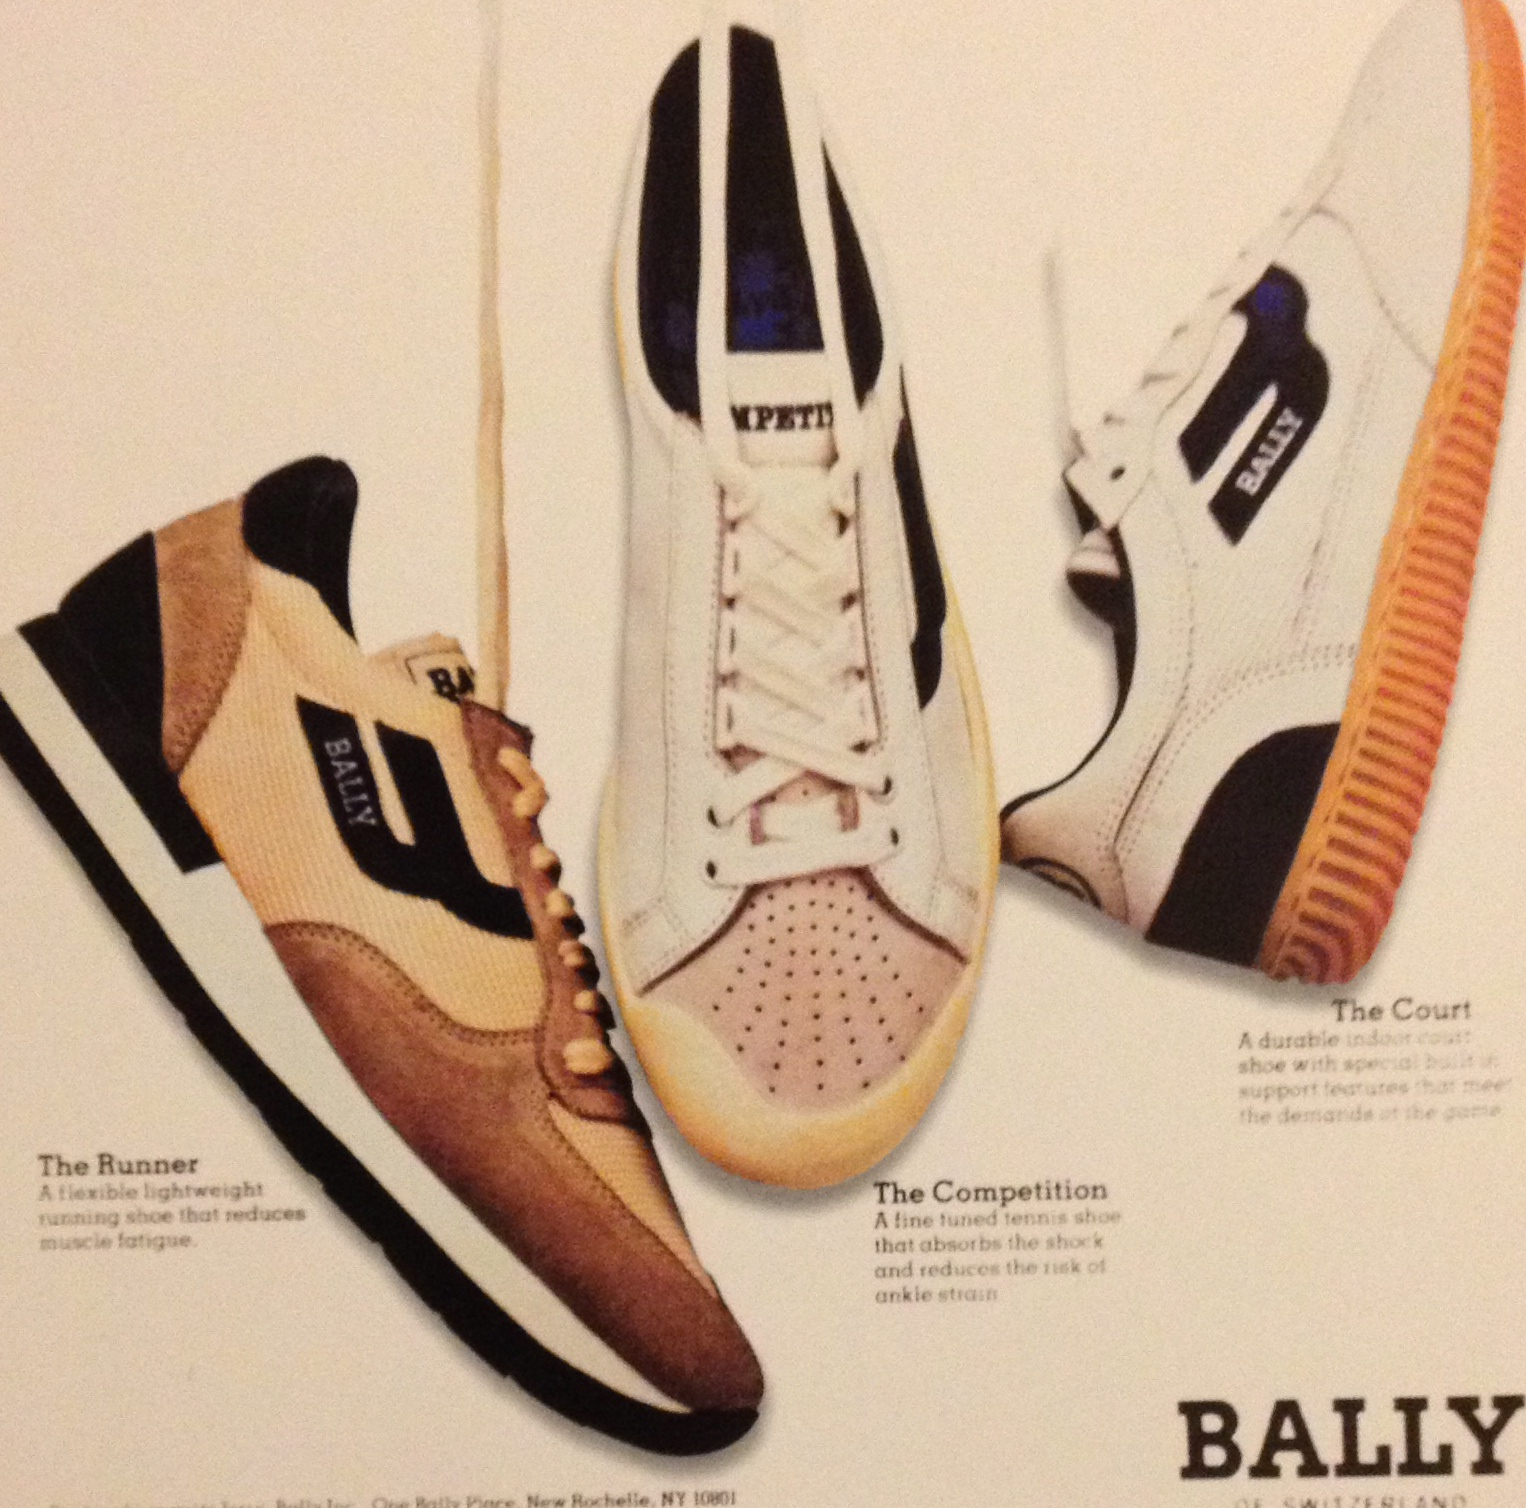 bally competition | GWARIZM